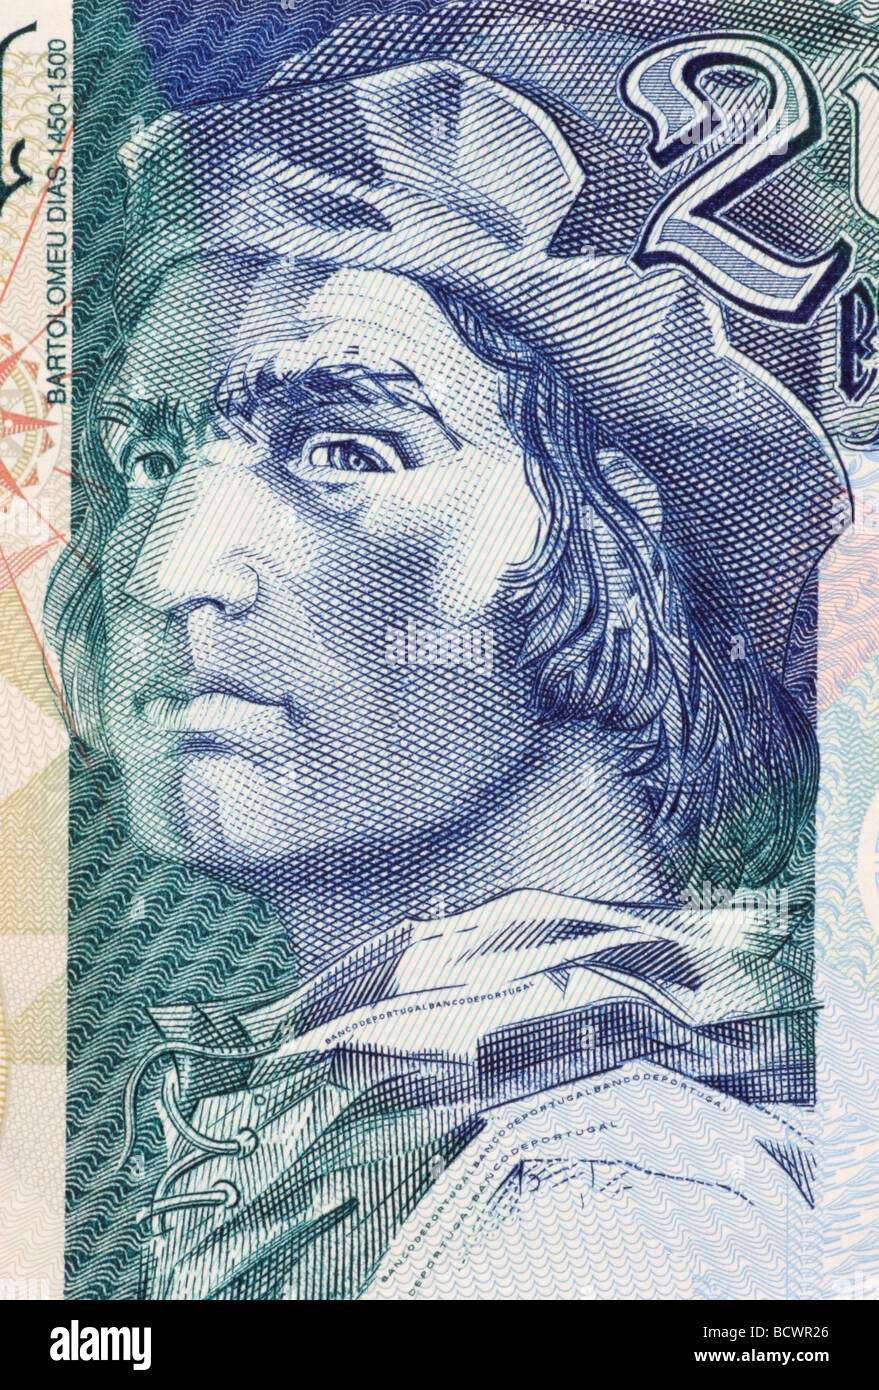 Bartolomeu Dias on 2000 Escudos 2000 Banknote from Portugal - Stock Image